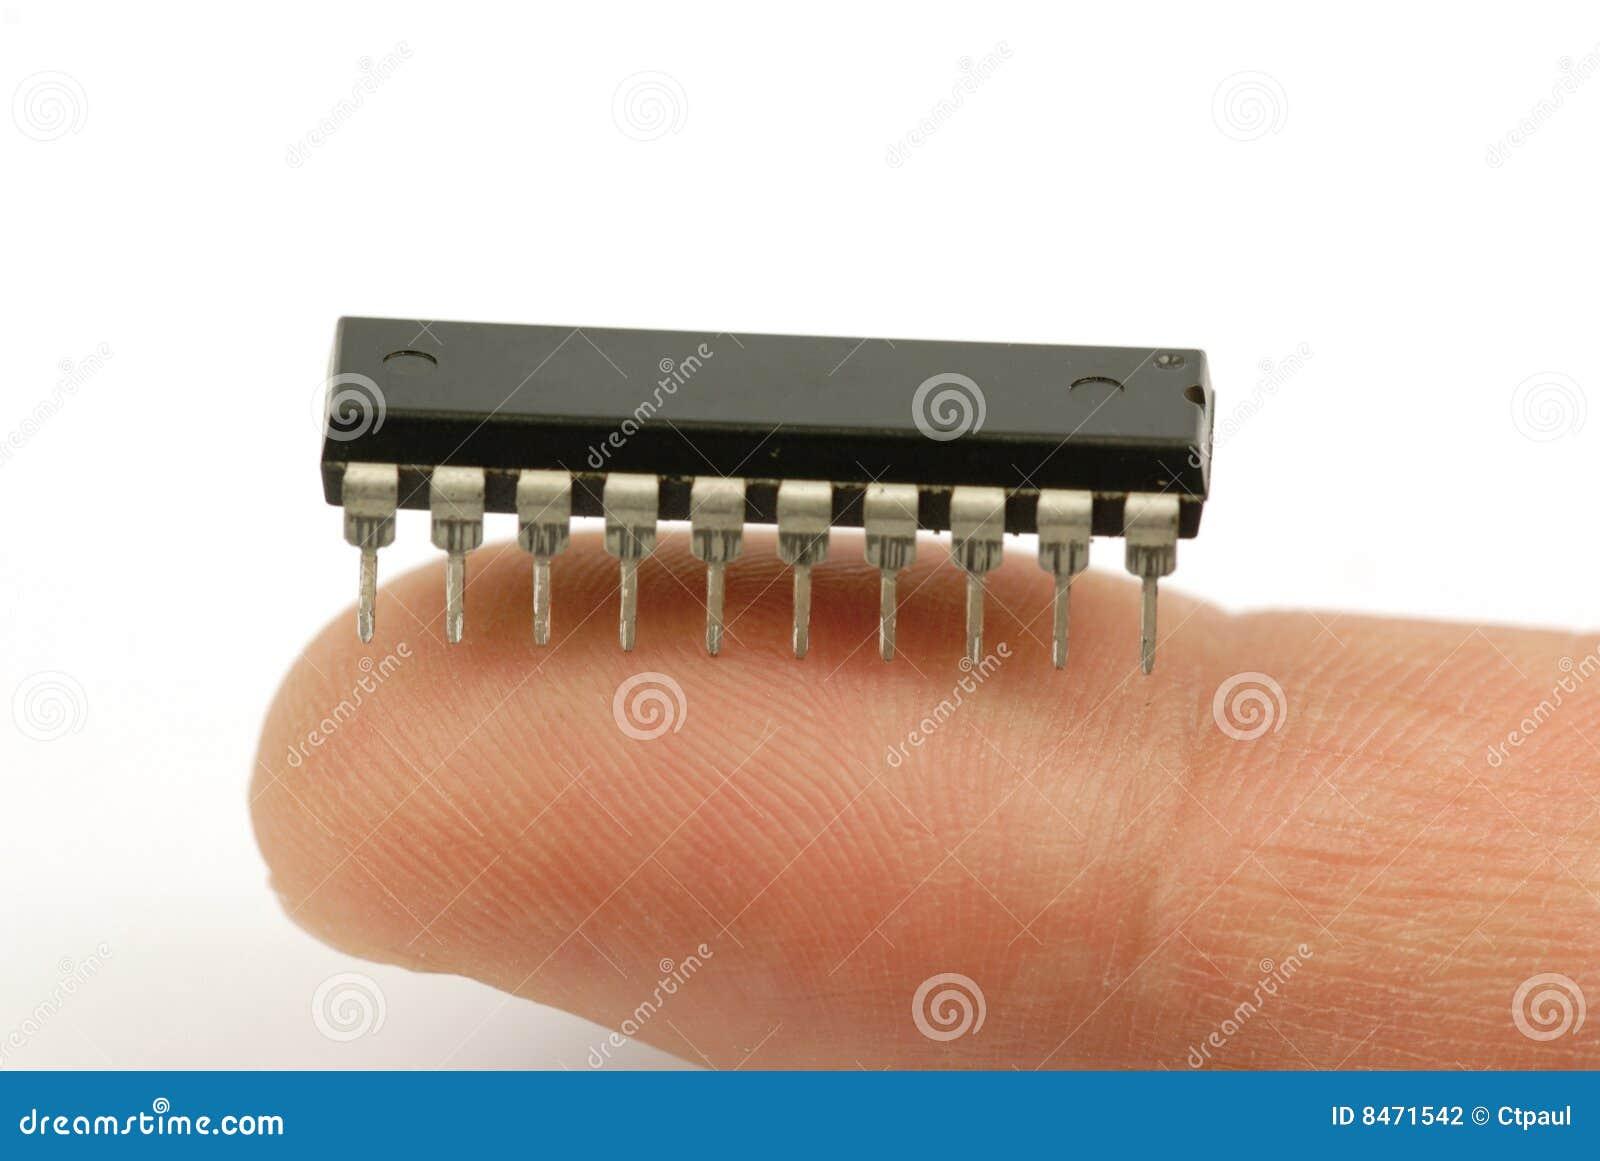 Chipfinger ic